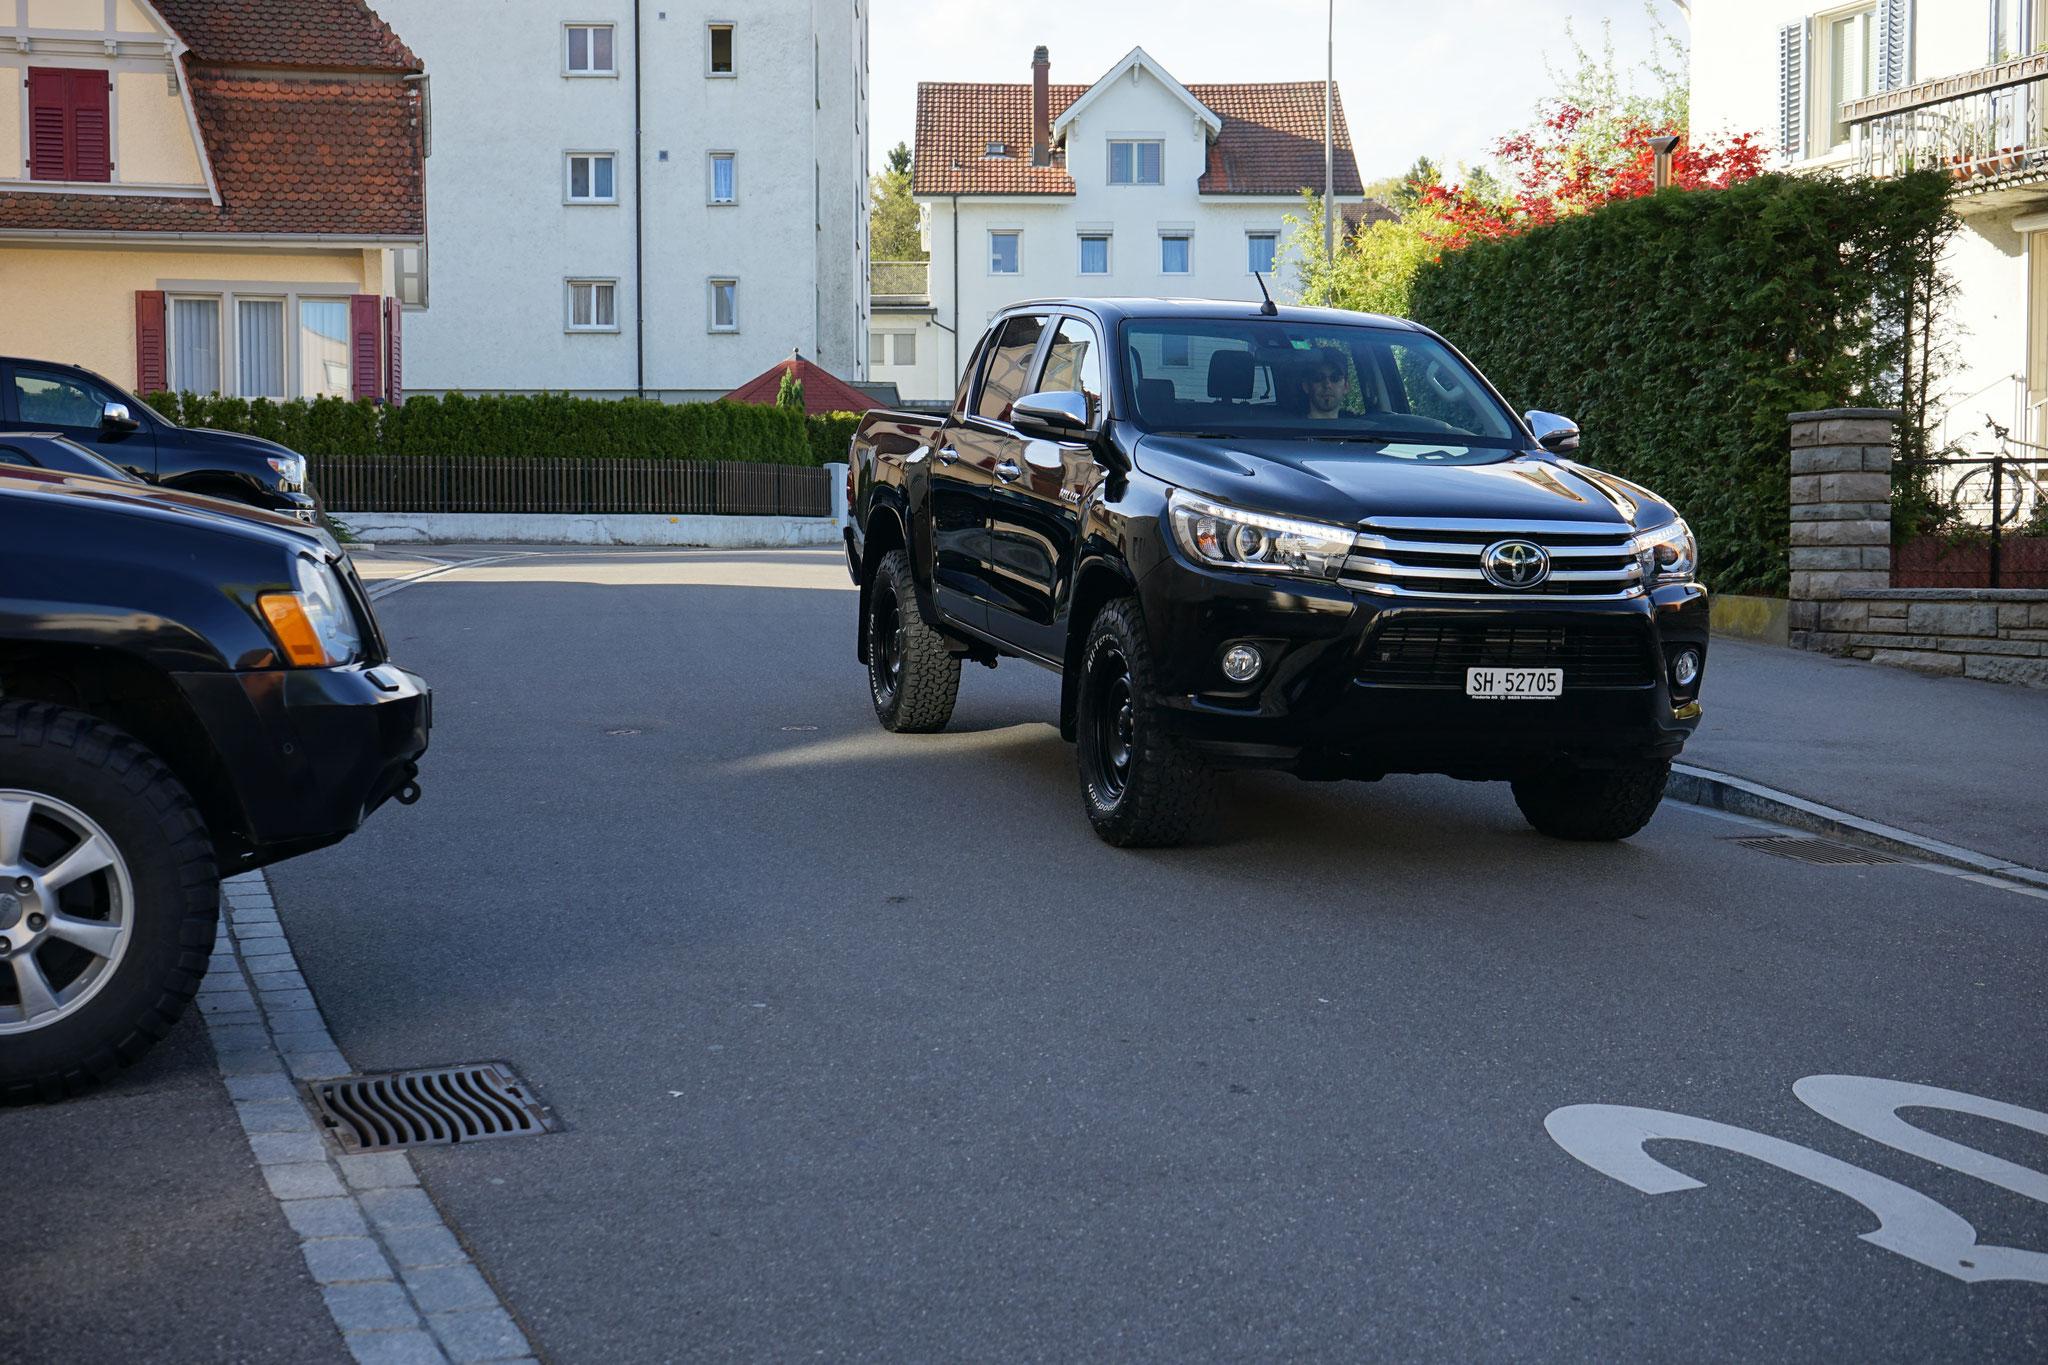 Toyota Hillux quadcab 2.4 Revo sol premium 4x4 Blackwolf Wolf78-overland.ch offroad 4x4 Bf goodrich